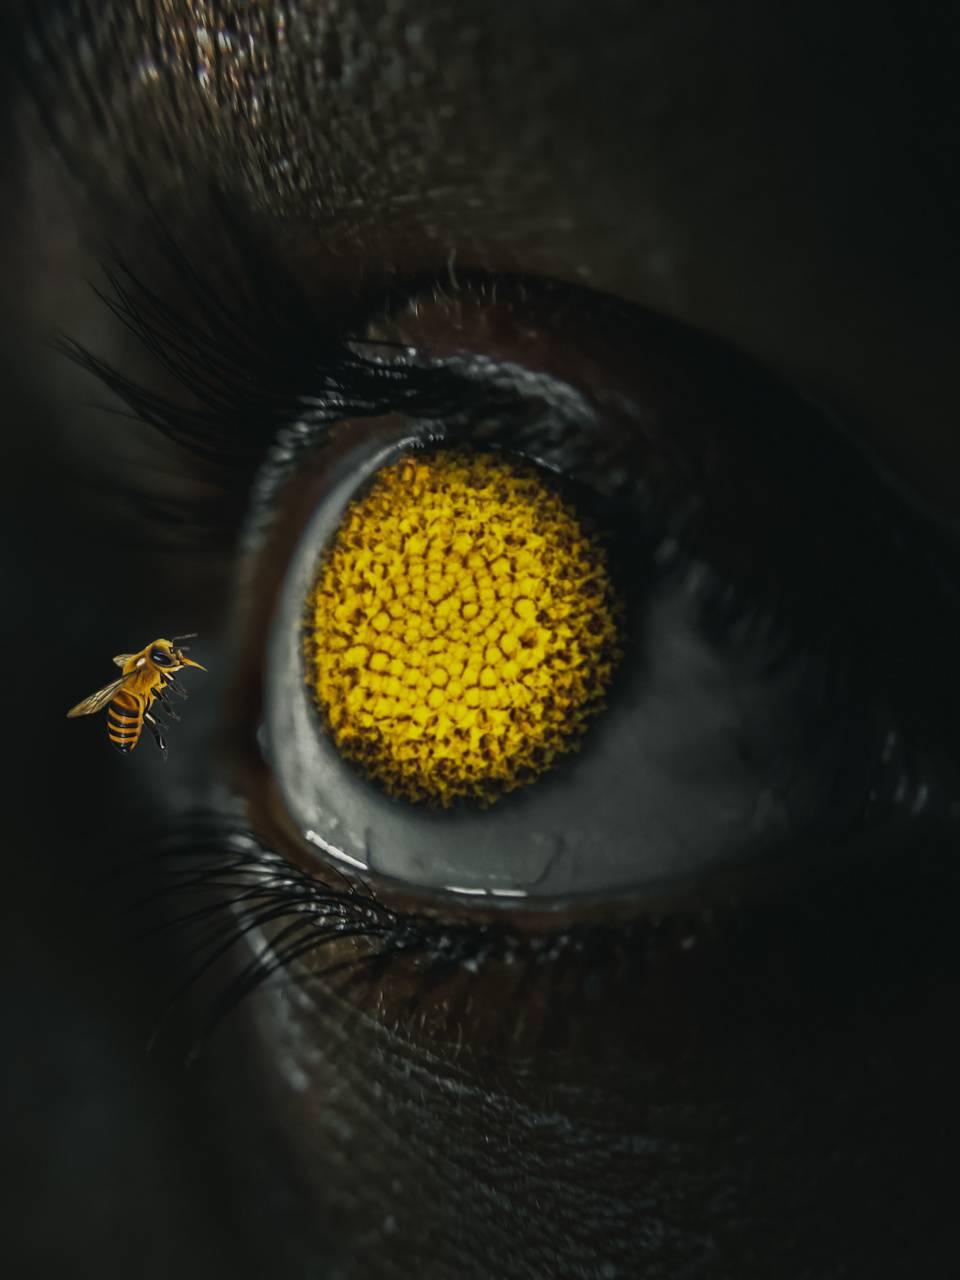 Editing eye